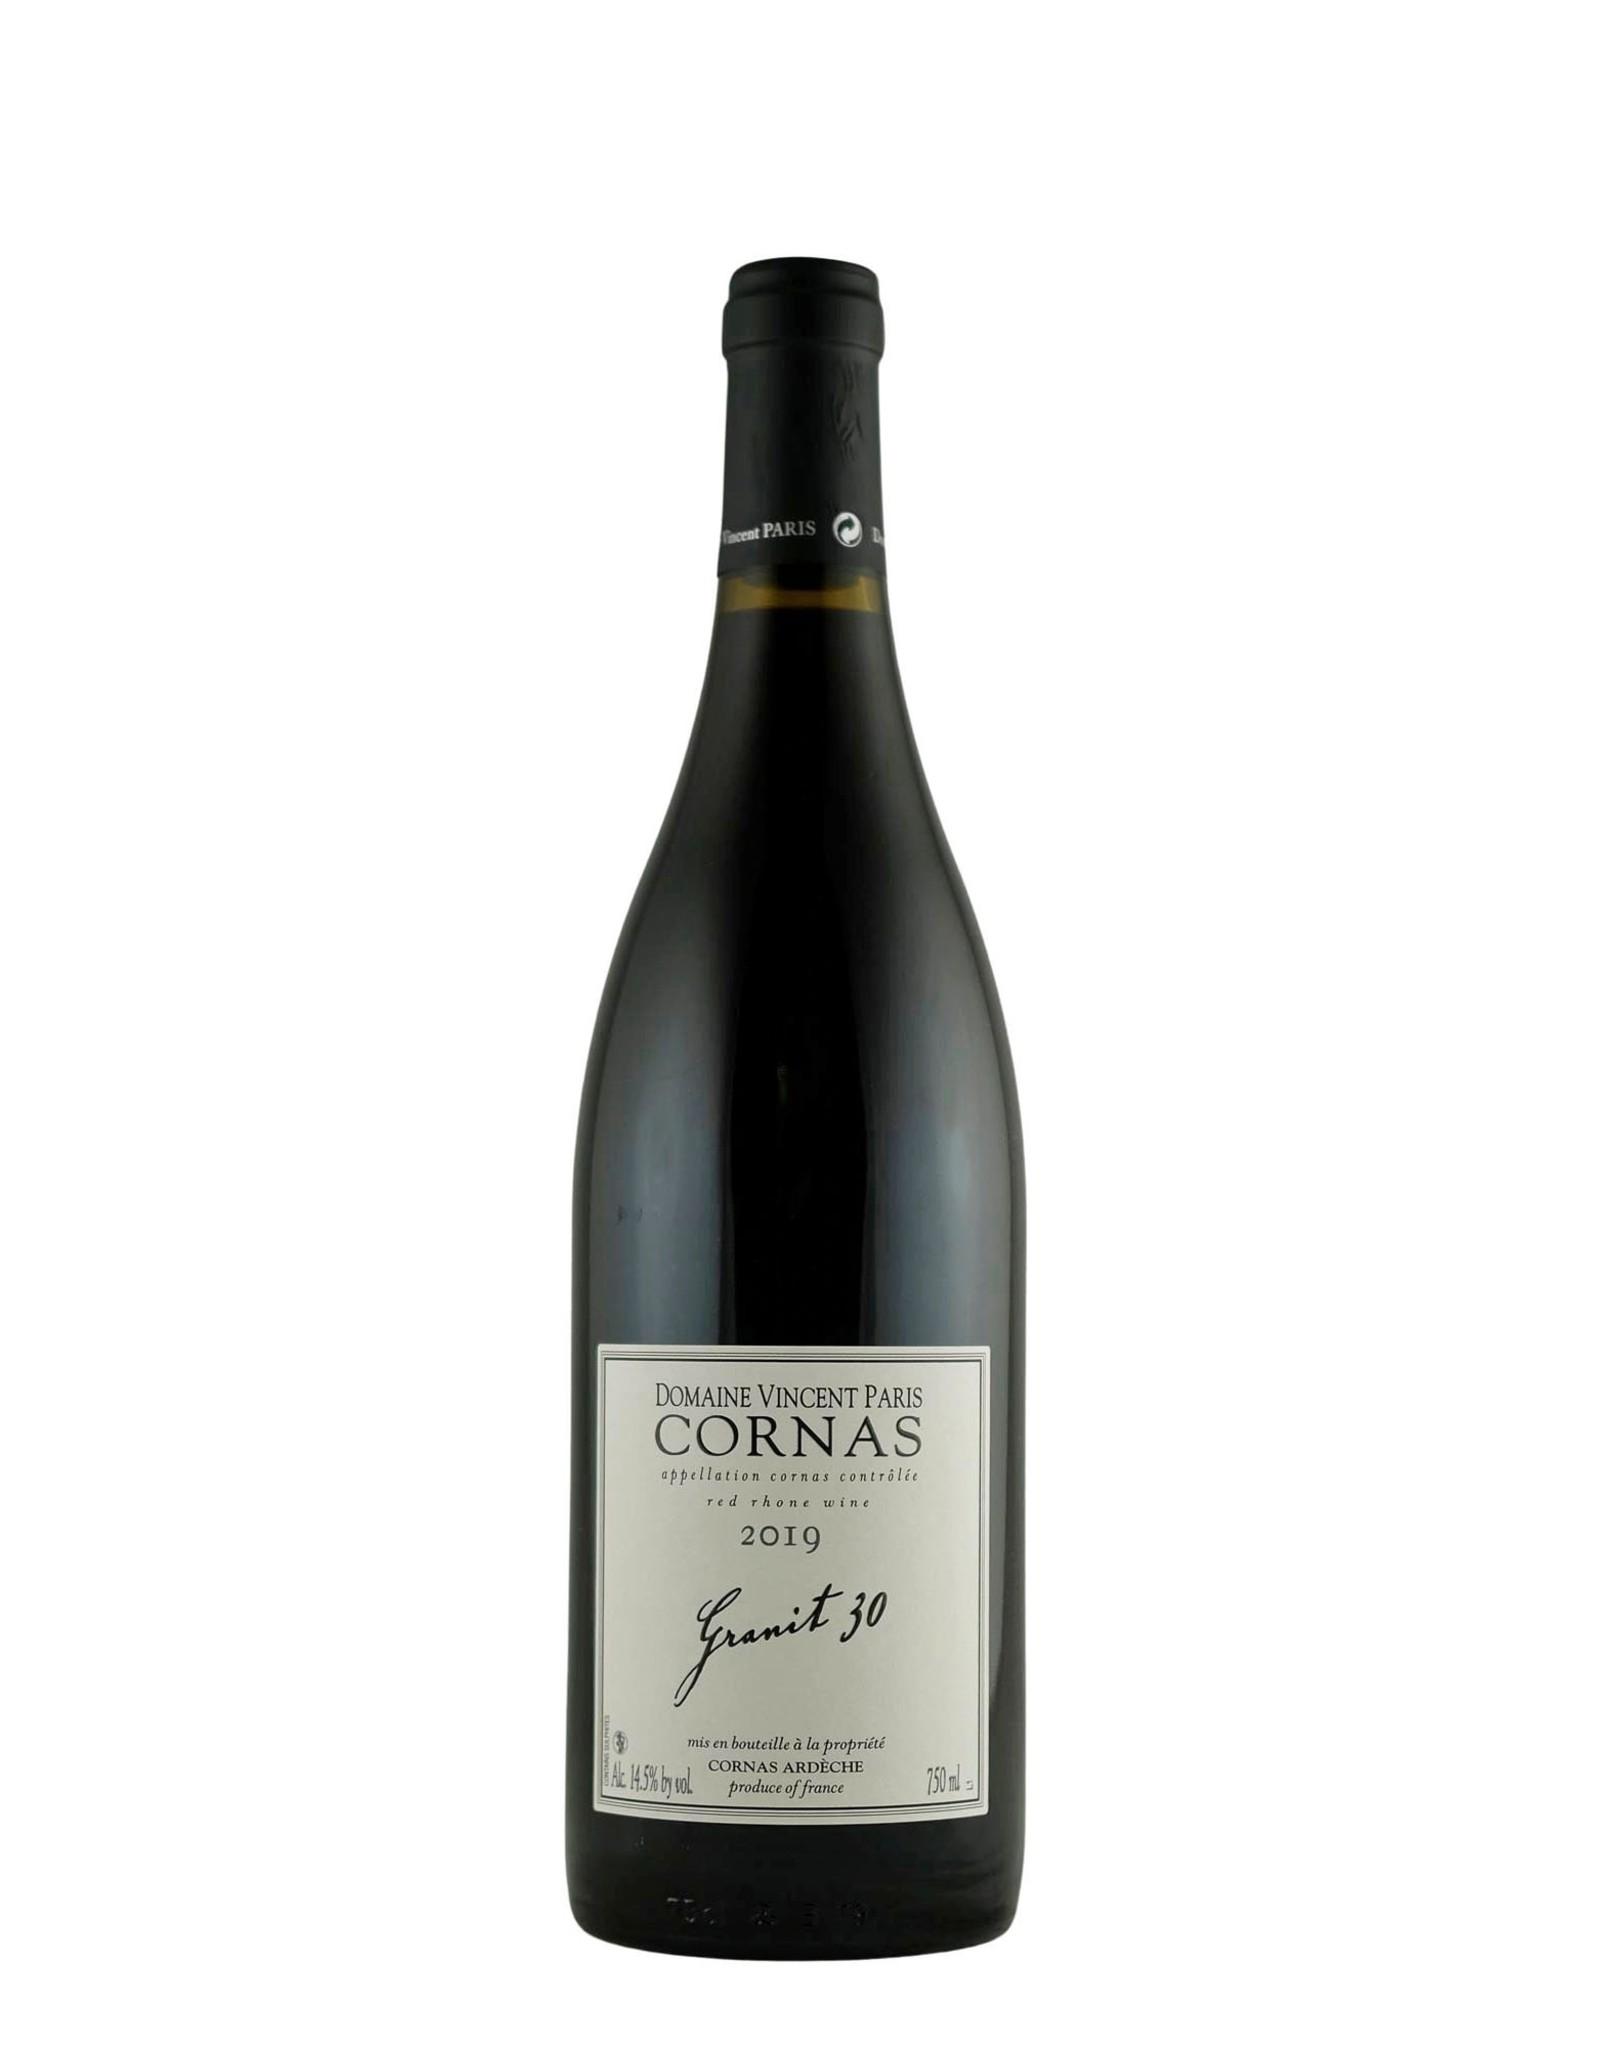 Dom. Vincent Paris 'Granit 30' Cornas